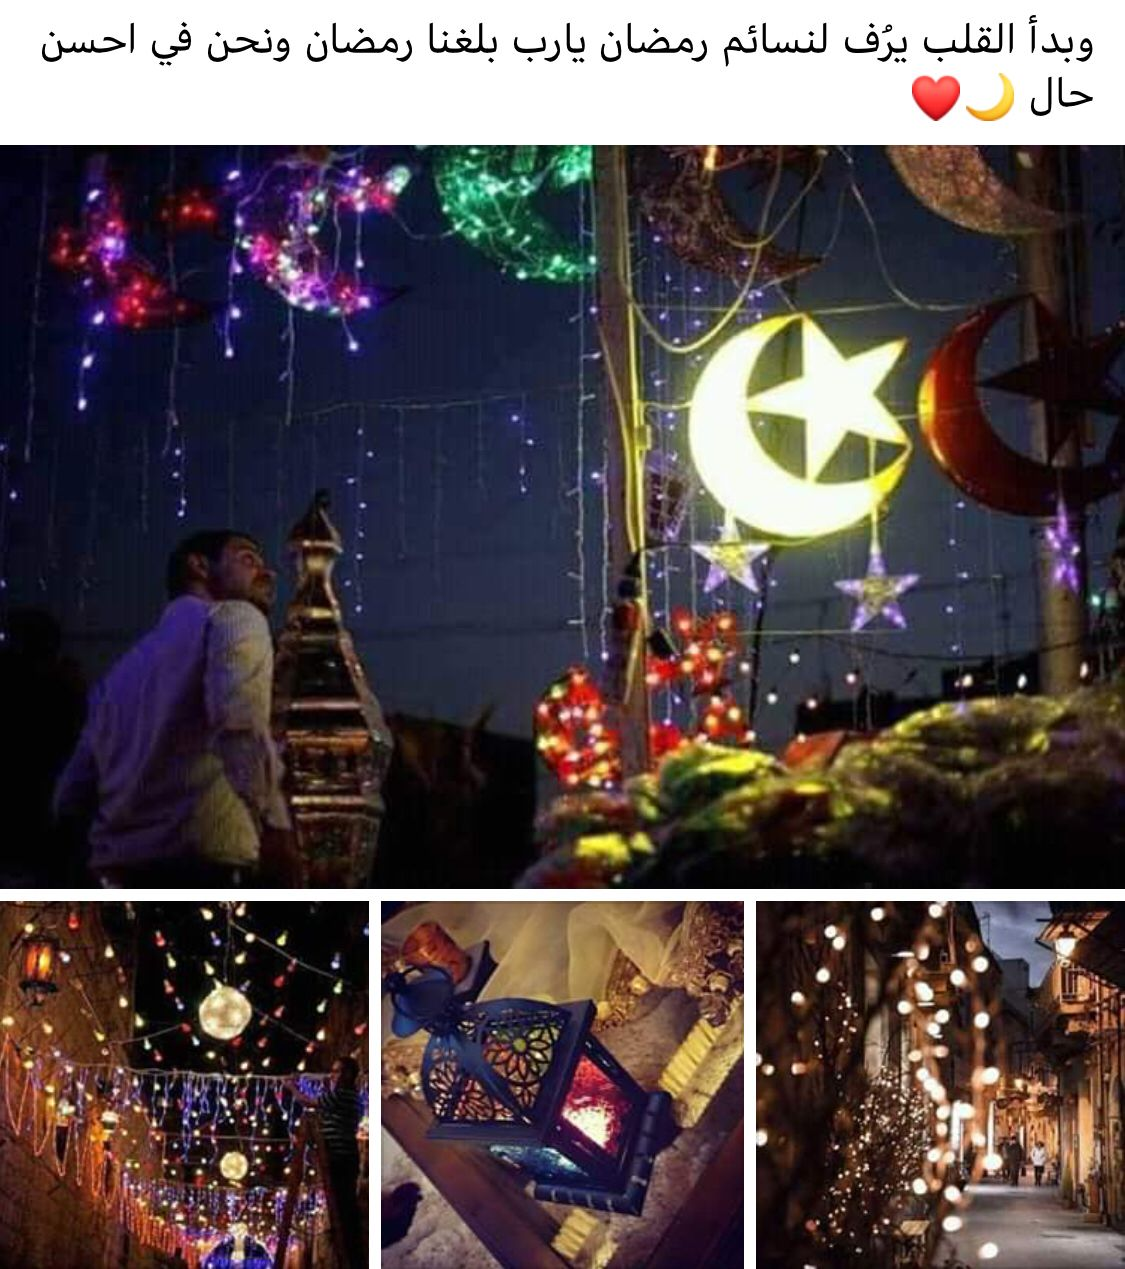 Pin By صورة و كلمة On رمضان كريم Ramadan Kareem Ramadan Kareem Ramadan Faith Inspiration